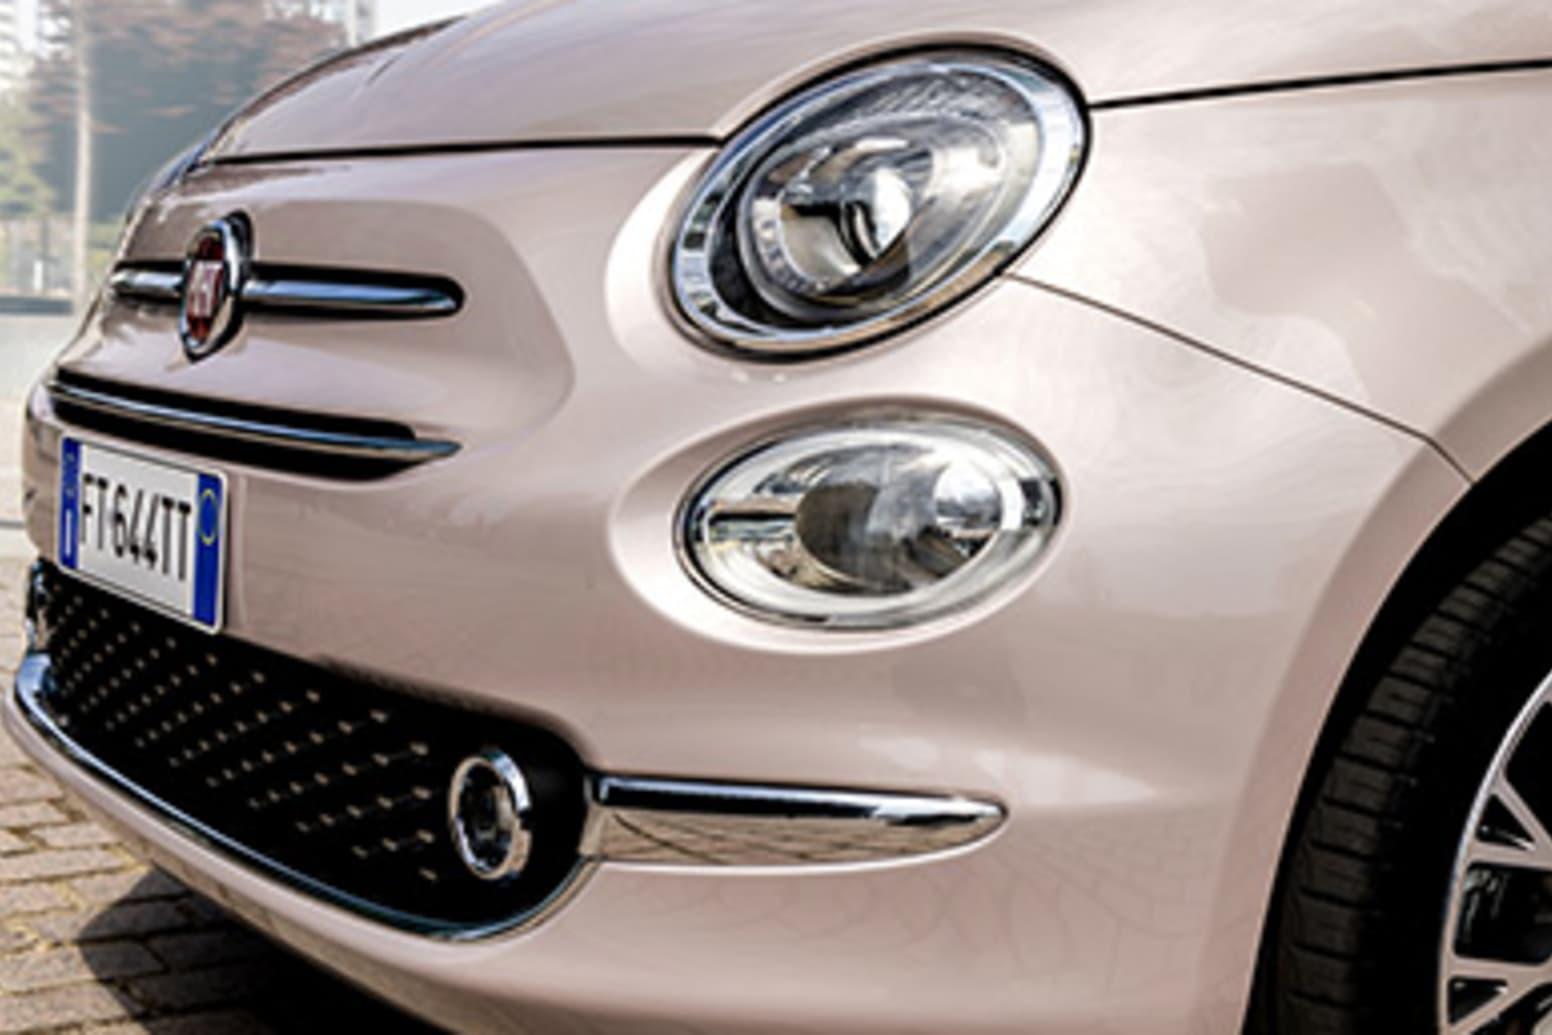 Fiat 500 Star Rockstar Newcastle Under Lyme Staffordshire Bs